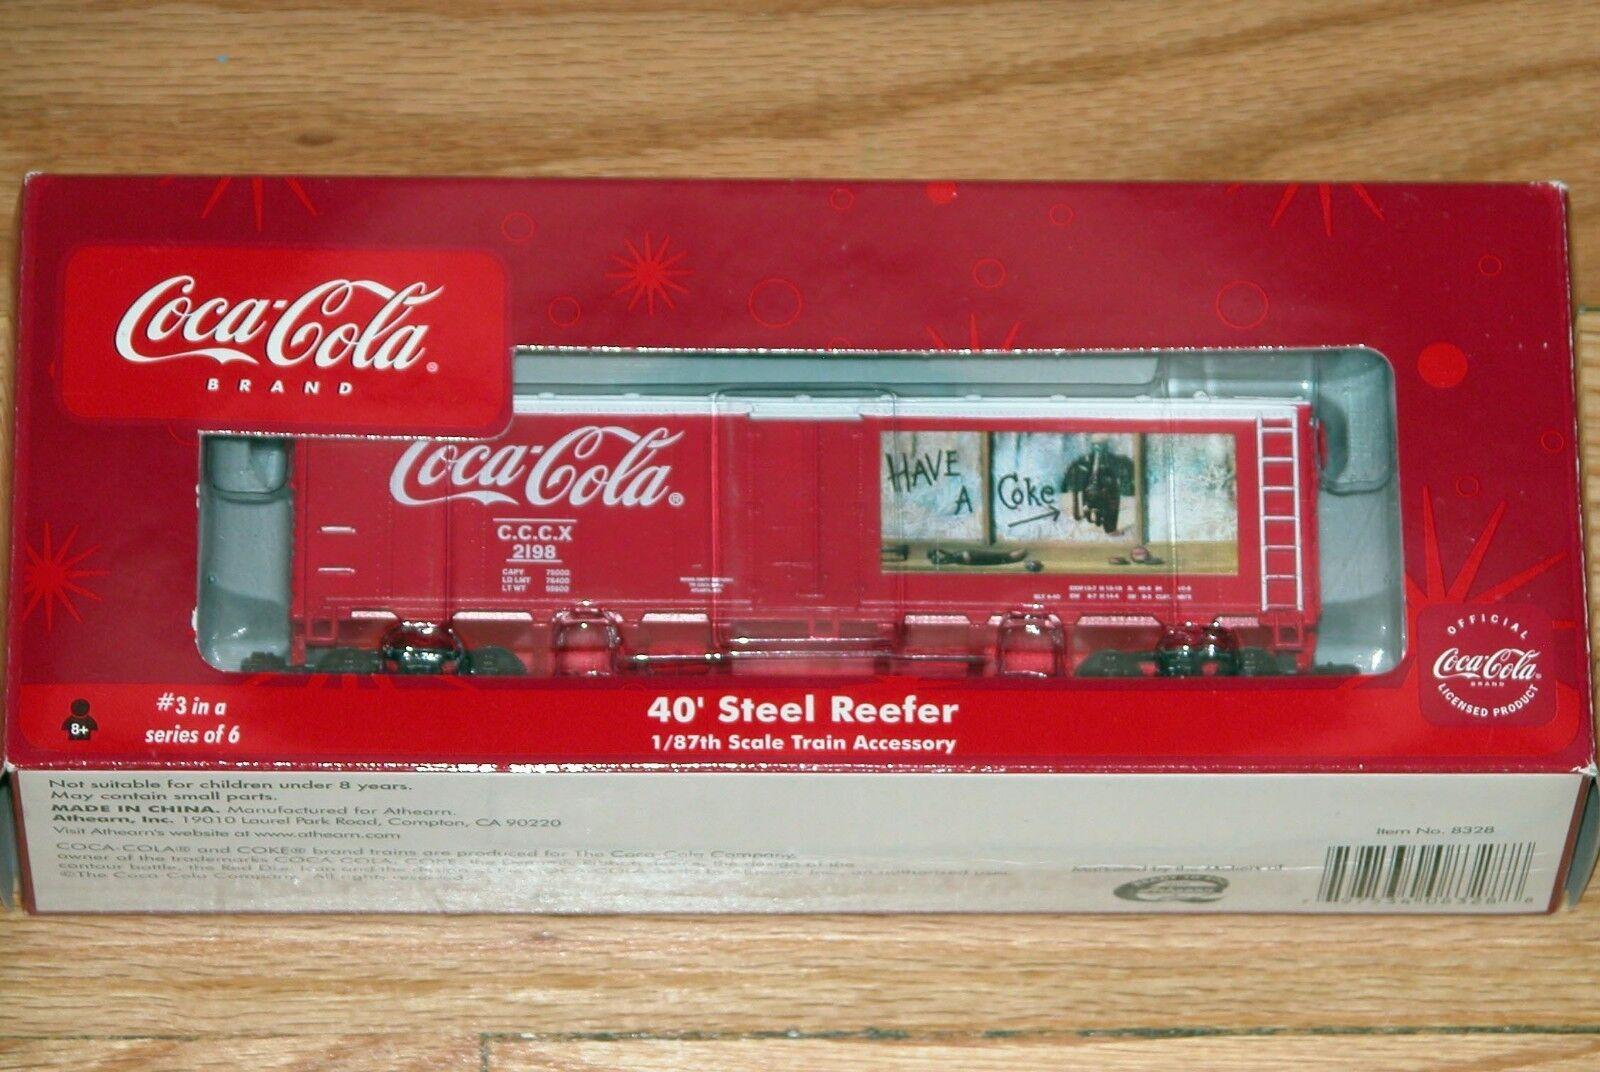 Athearn 8328 Coca-Cola Tren serie 40' Acero hierba   3 cccx 2198